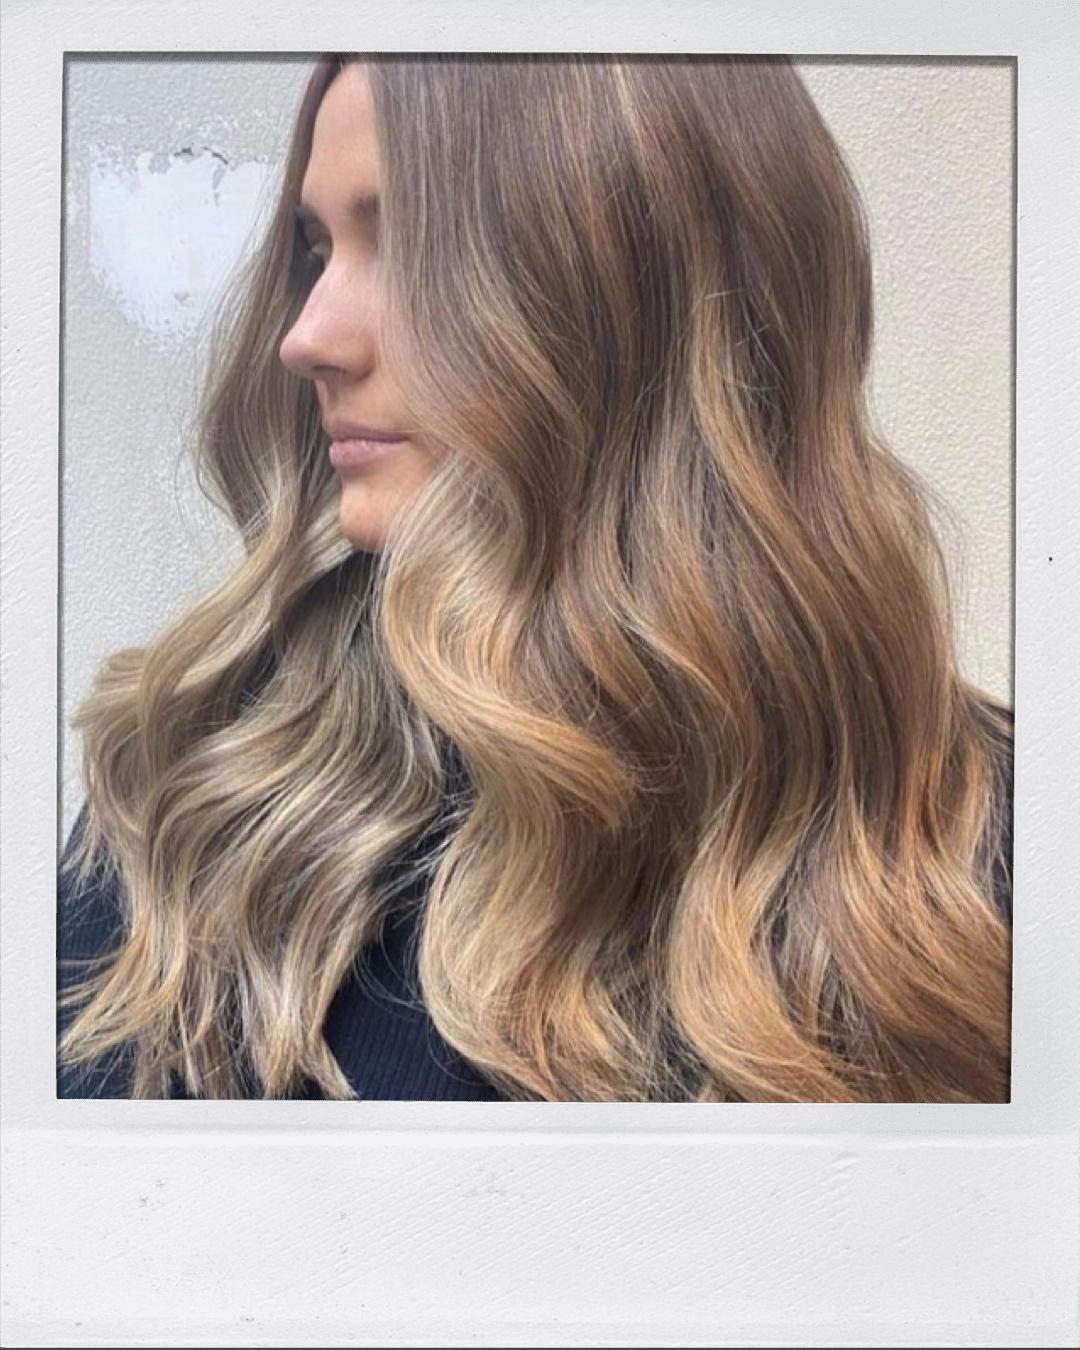 balayage_week_toni&guy_preguntas_respuestas_hairstyle_blonde_hair_1